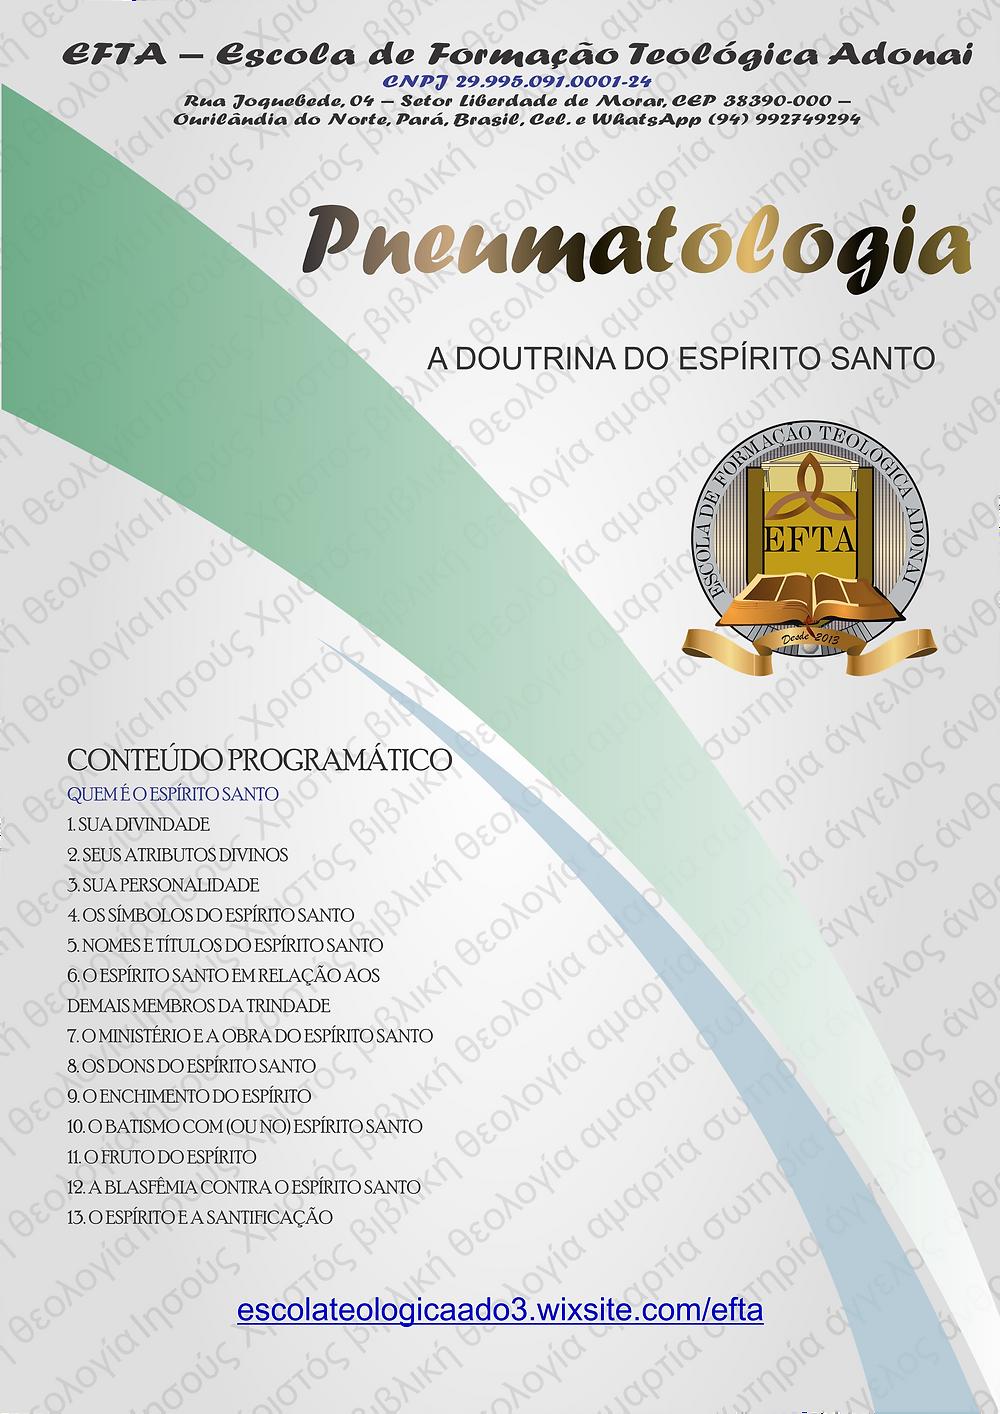 Curso Pneumatologia